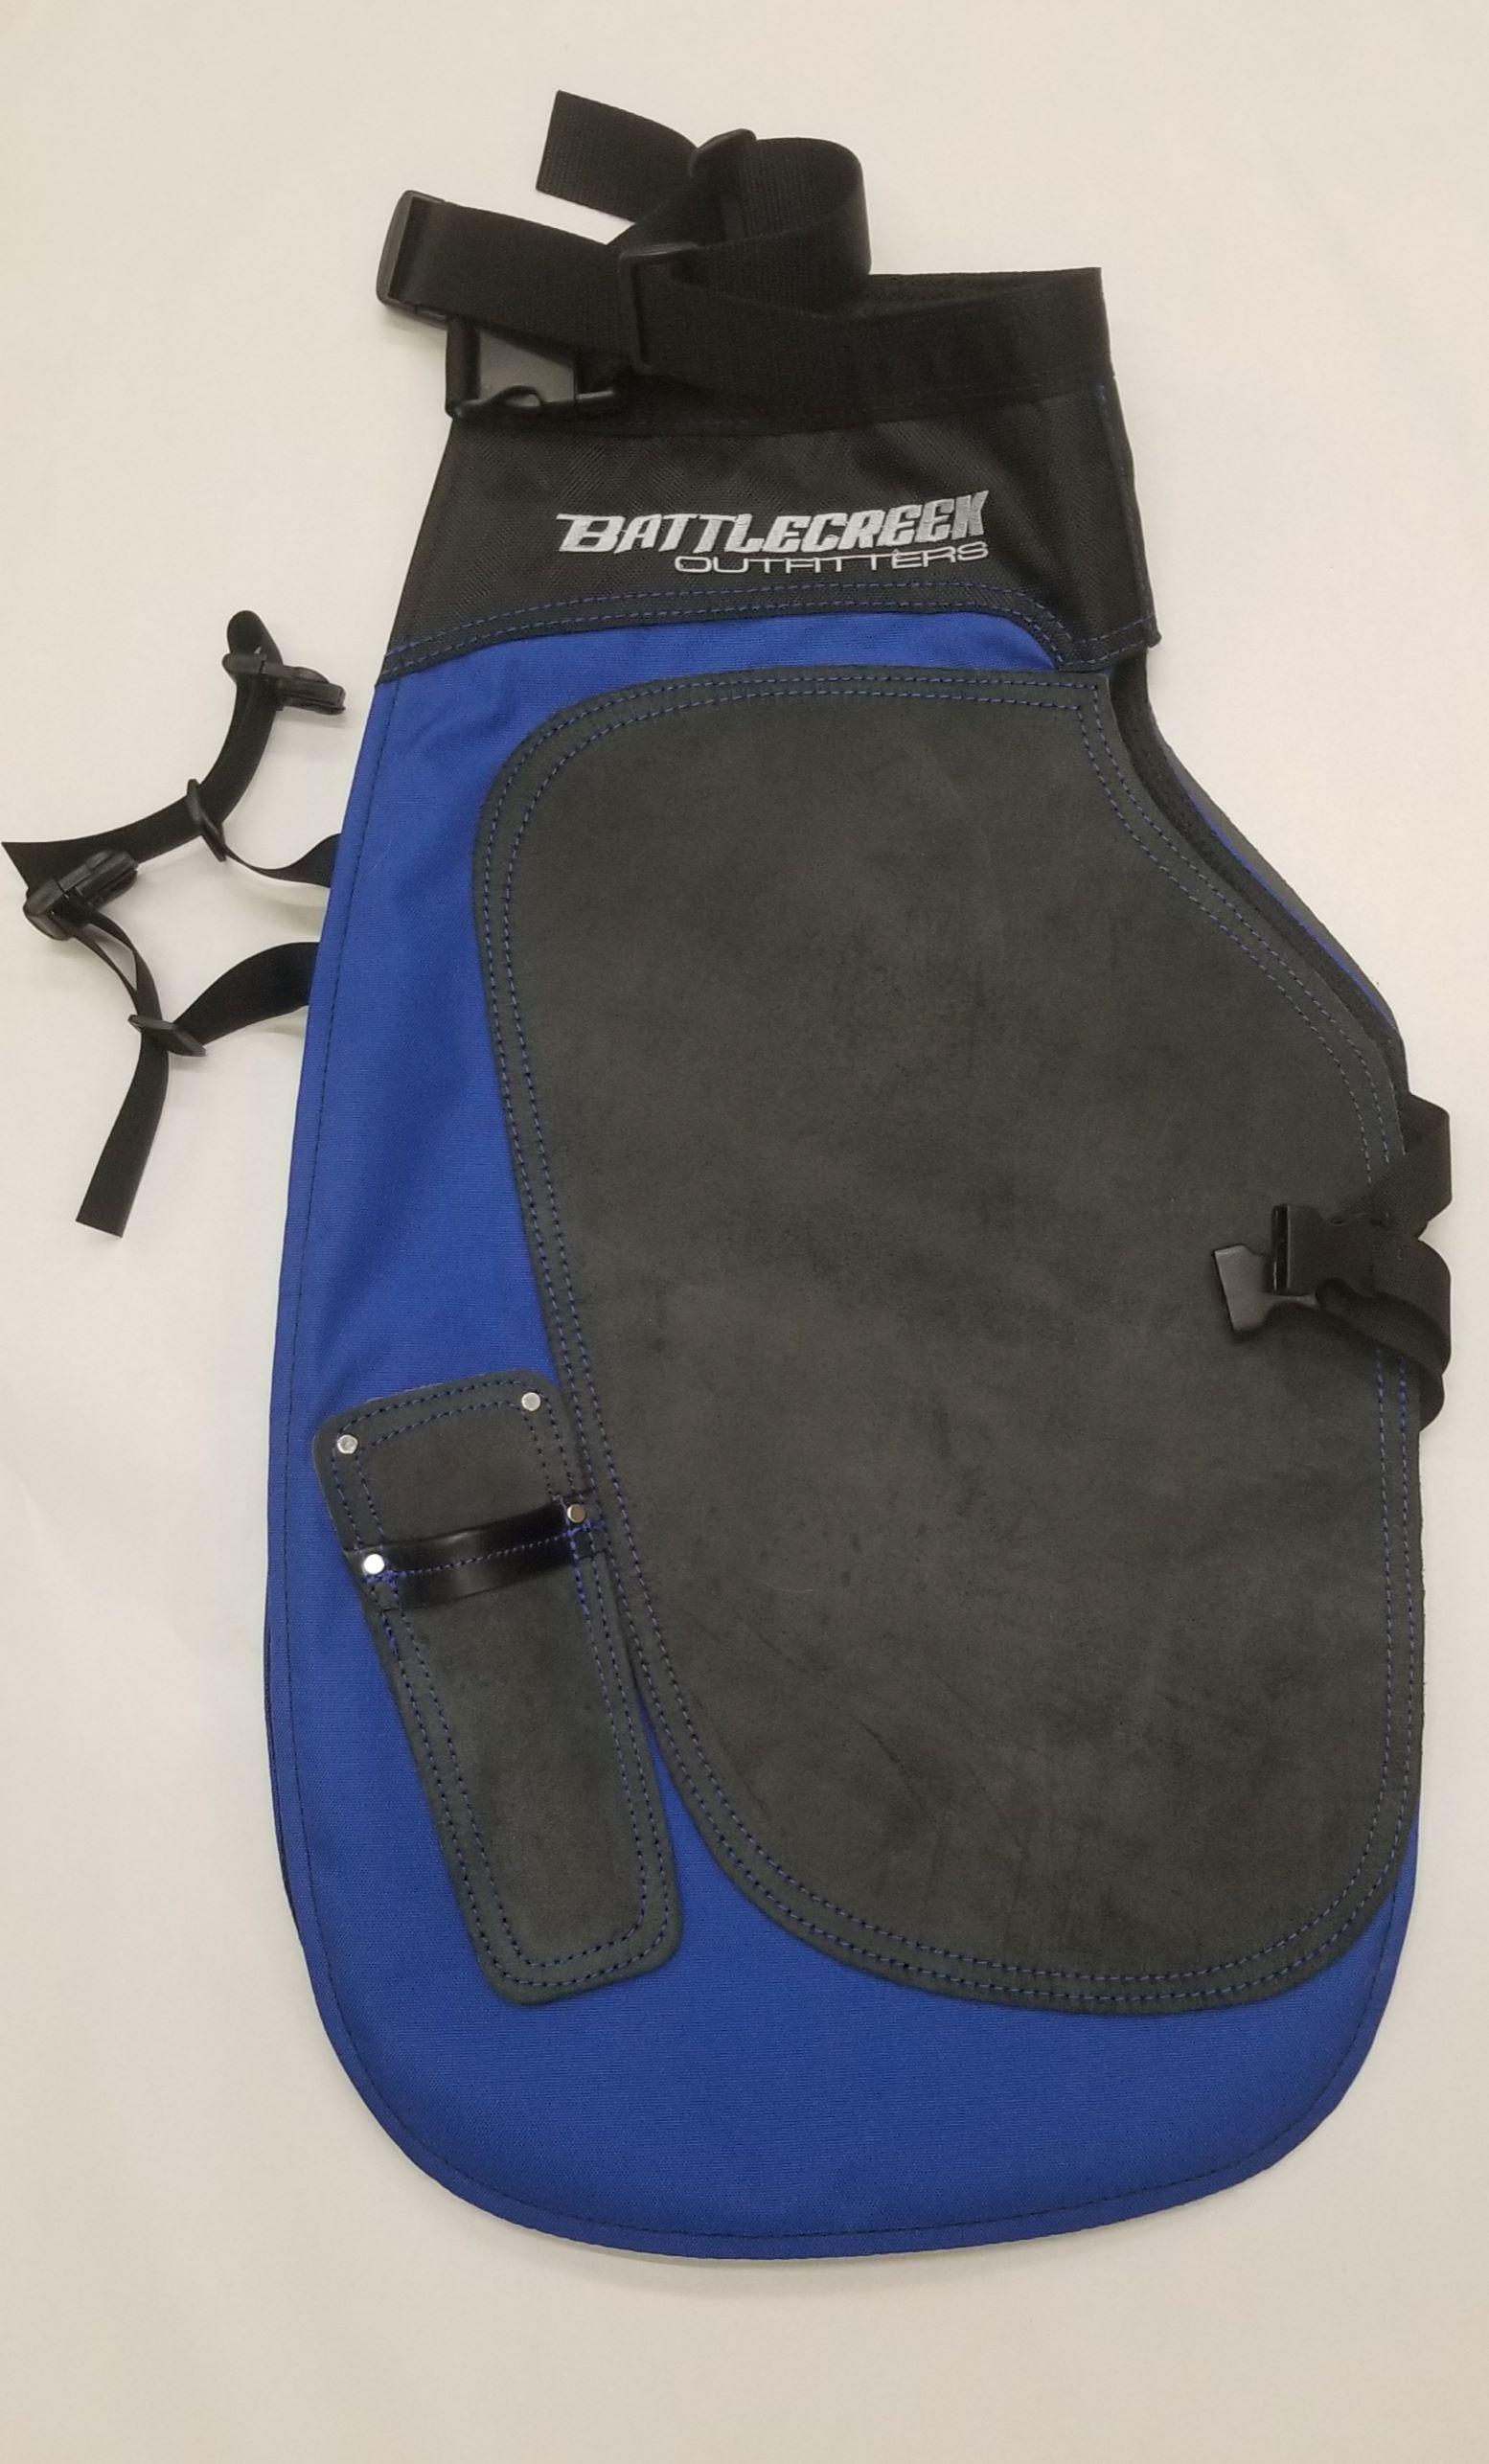 Battlecreek Outfitter Apron Blue/Black